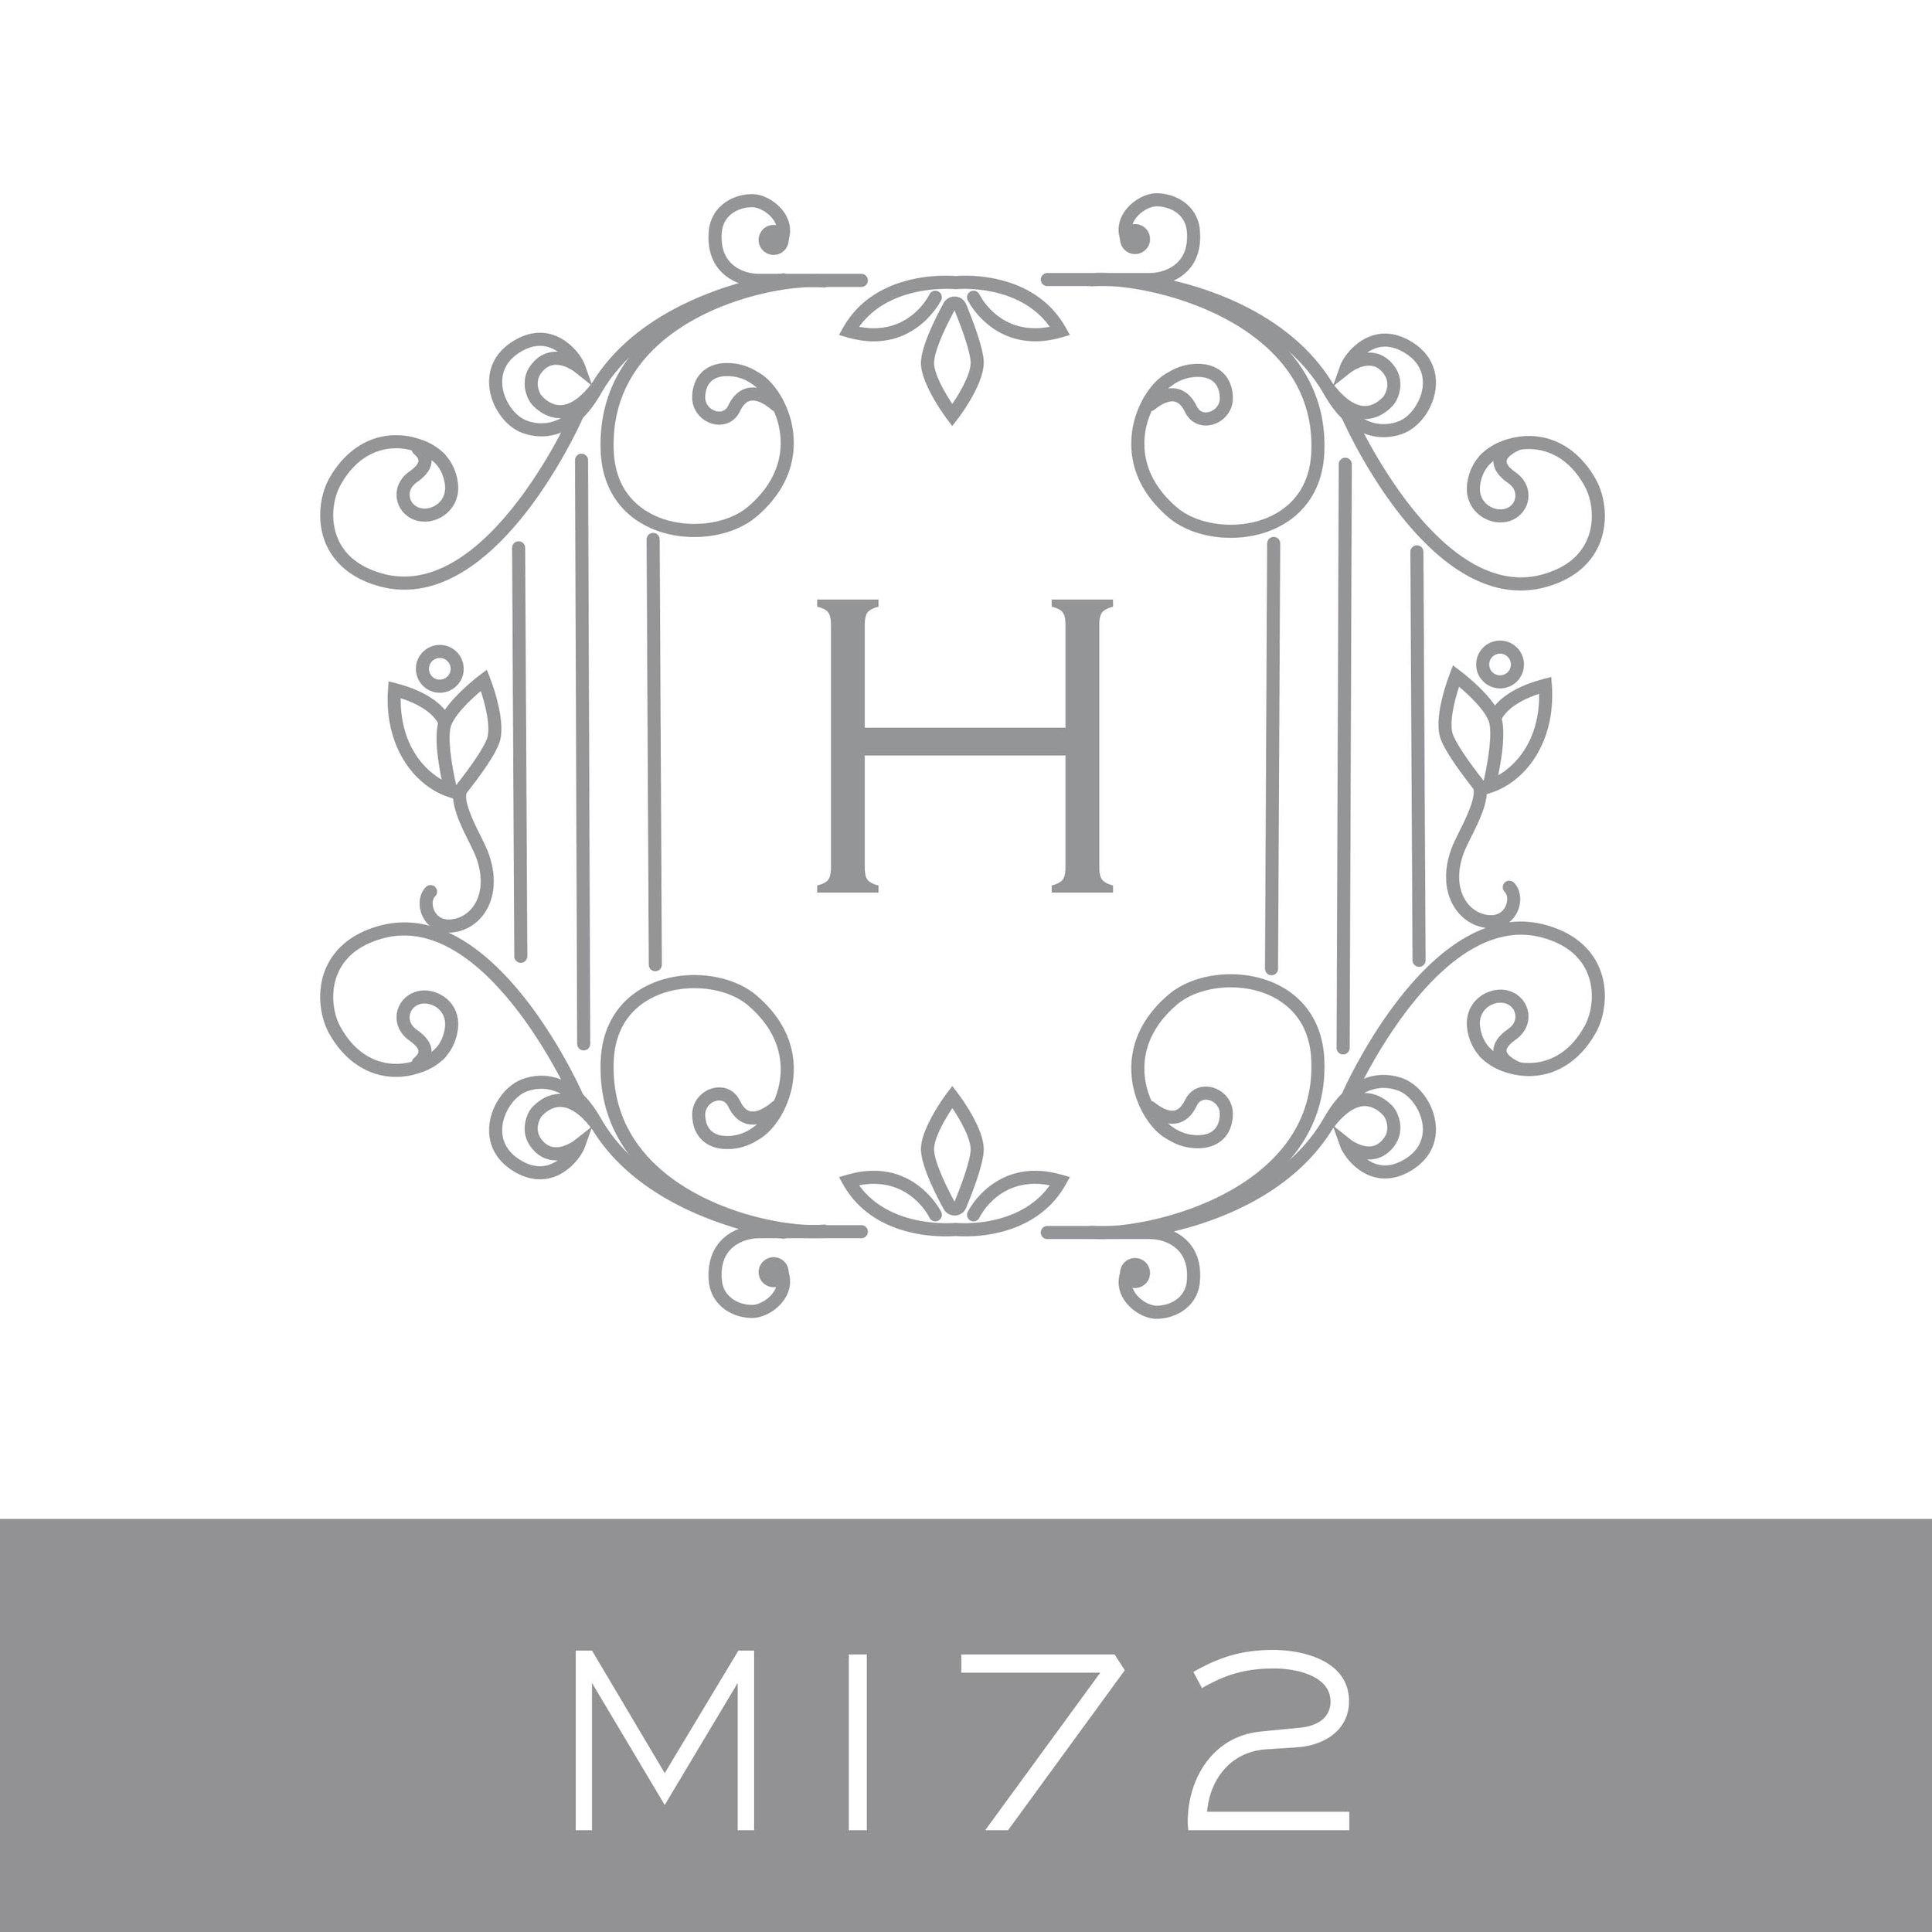 M172.jpg